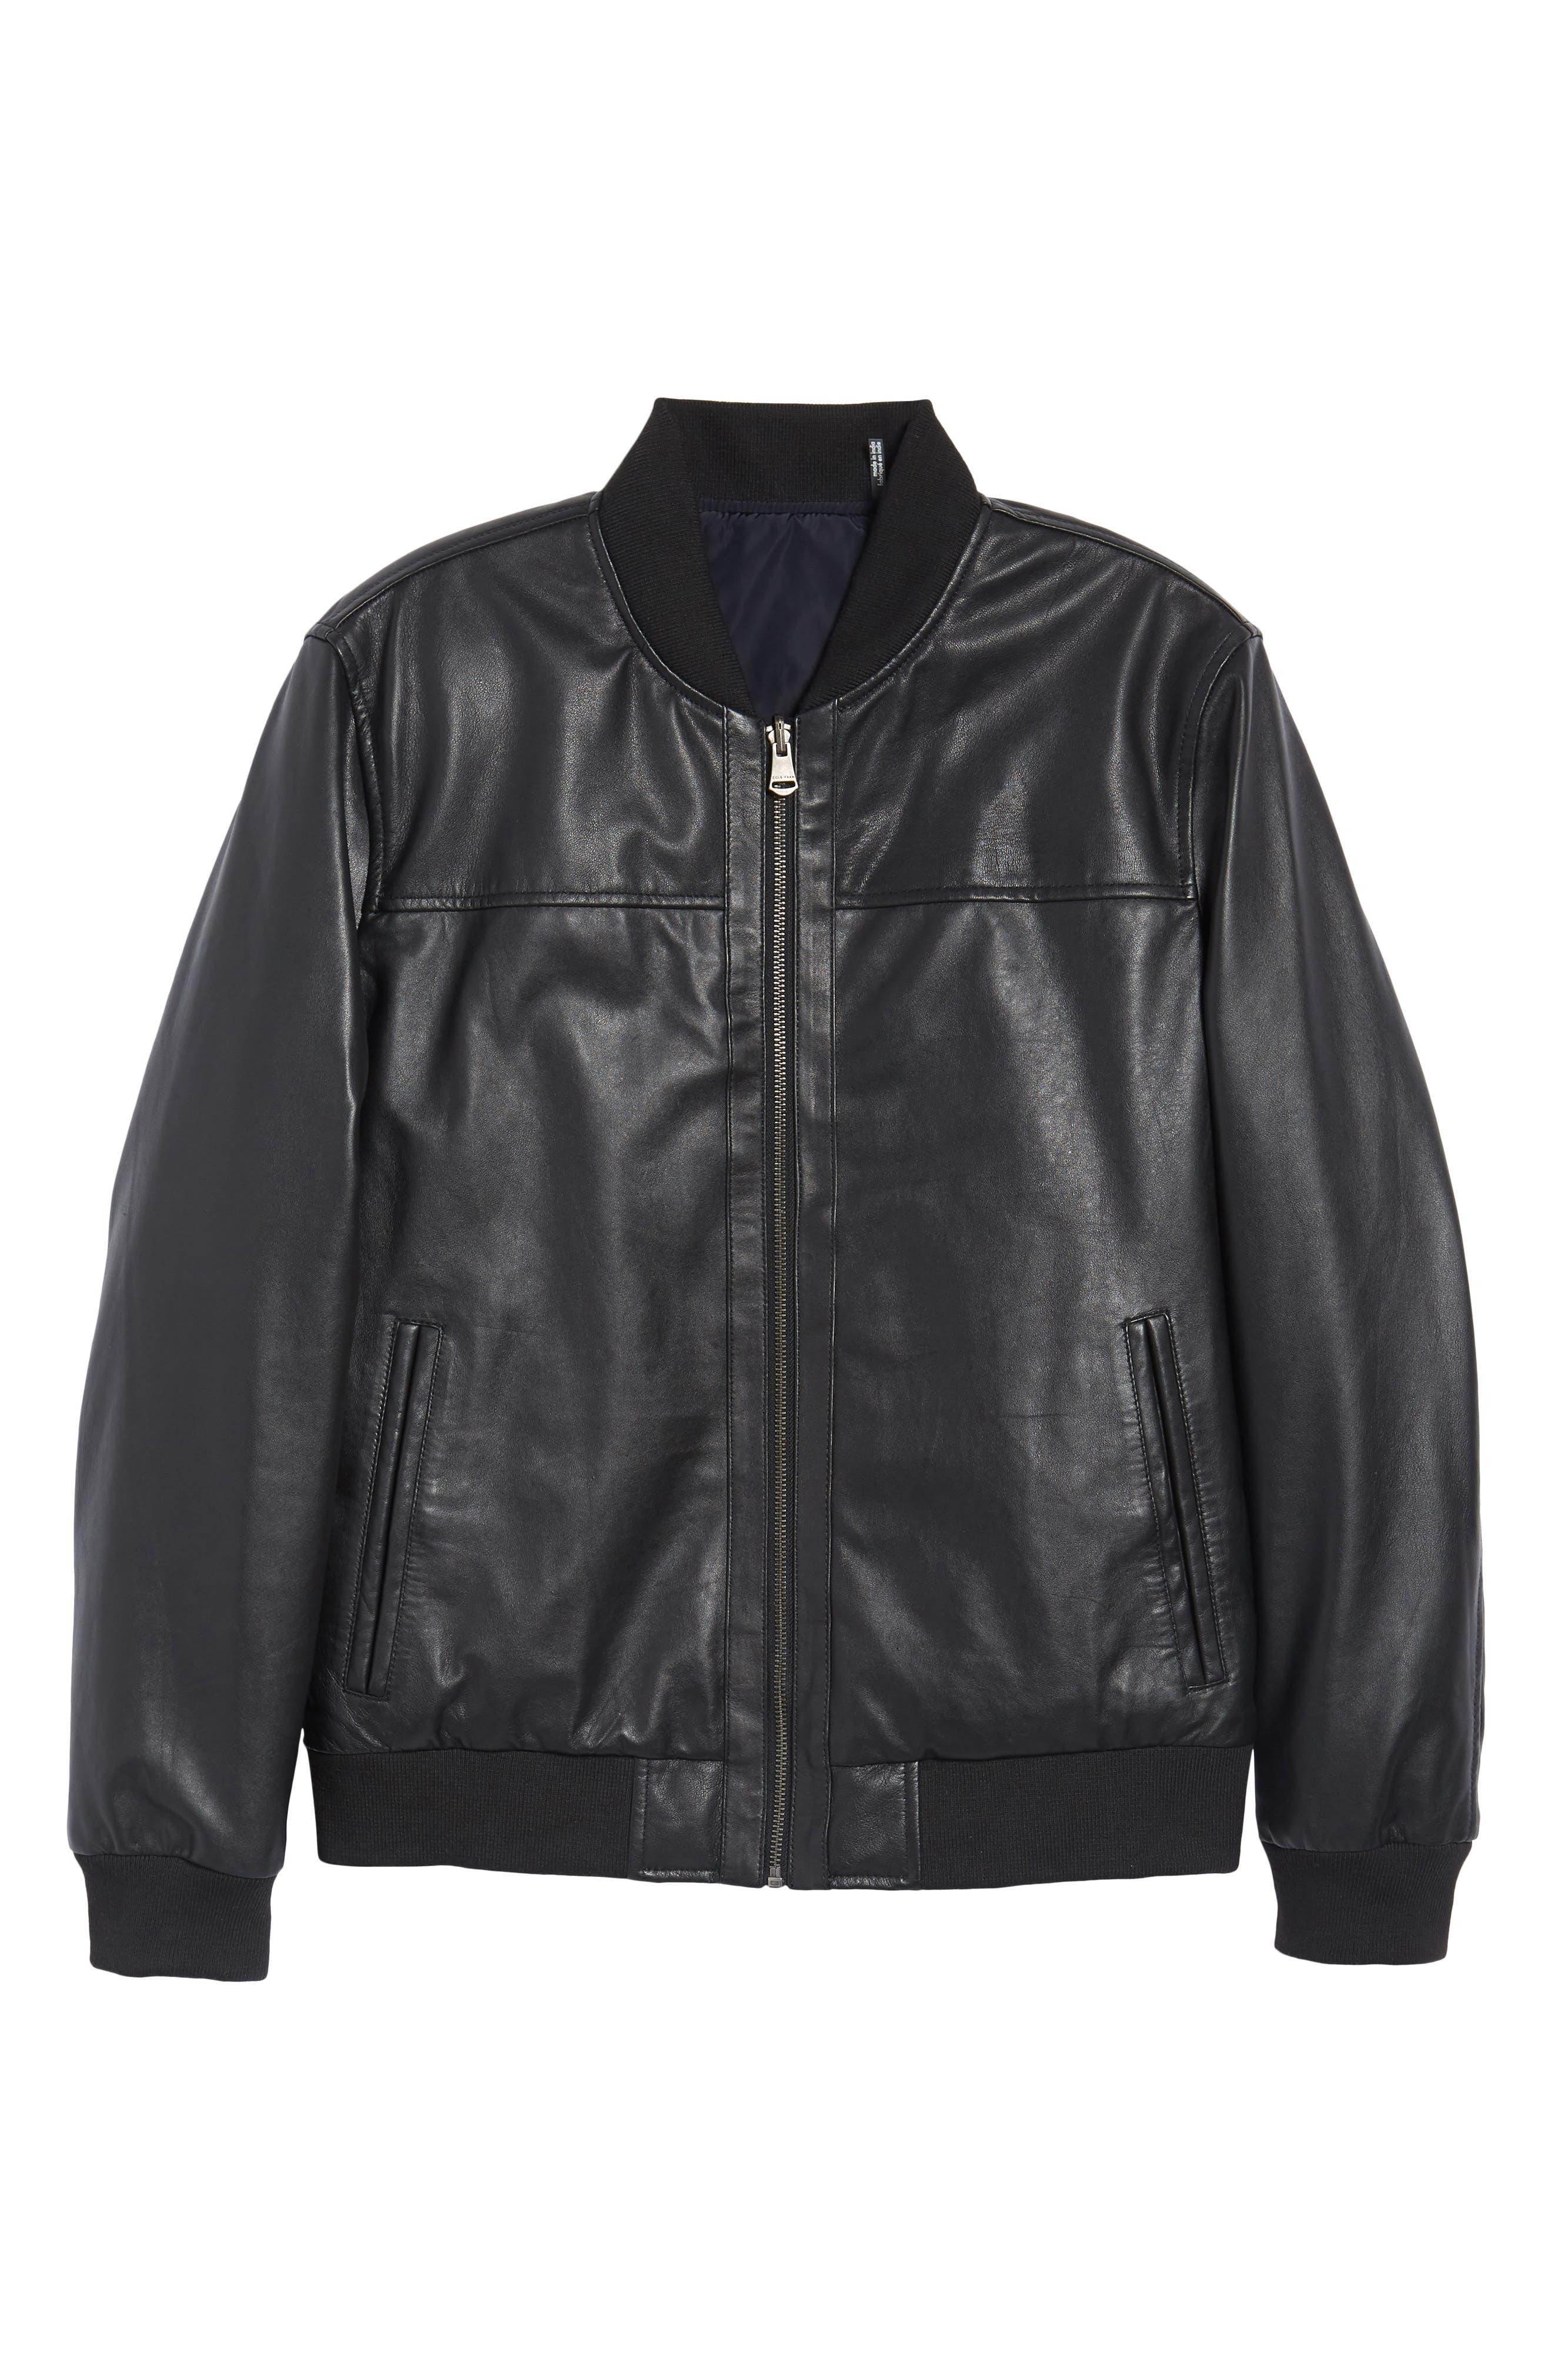 Reversible Leather Jacket,                             Alternate thumbnail 7, color,                             Black/ Navy